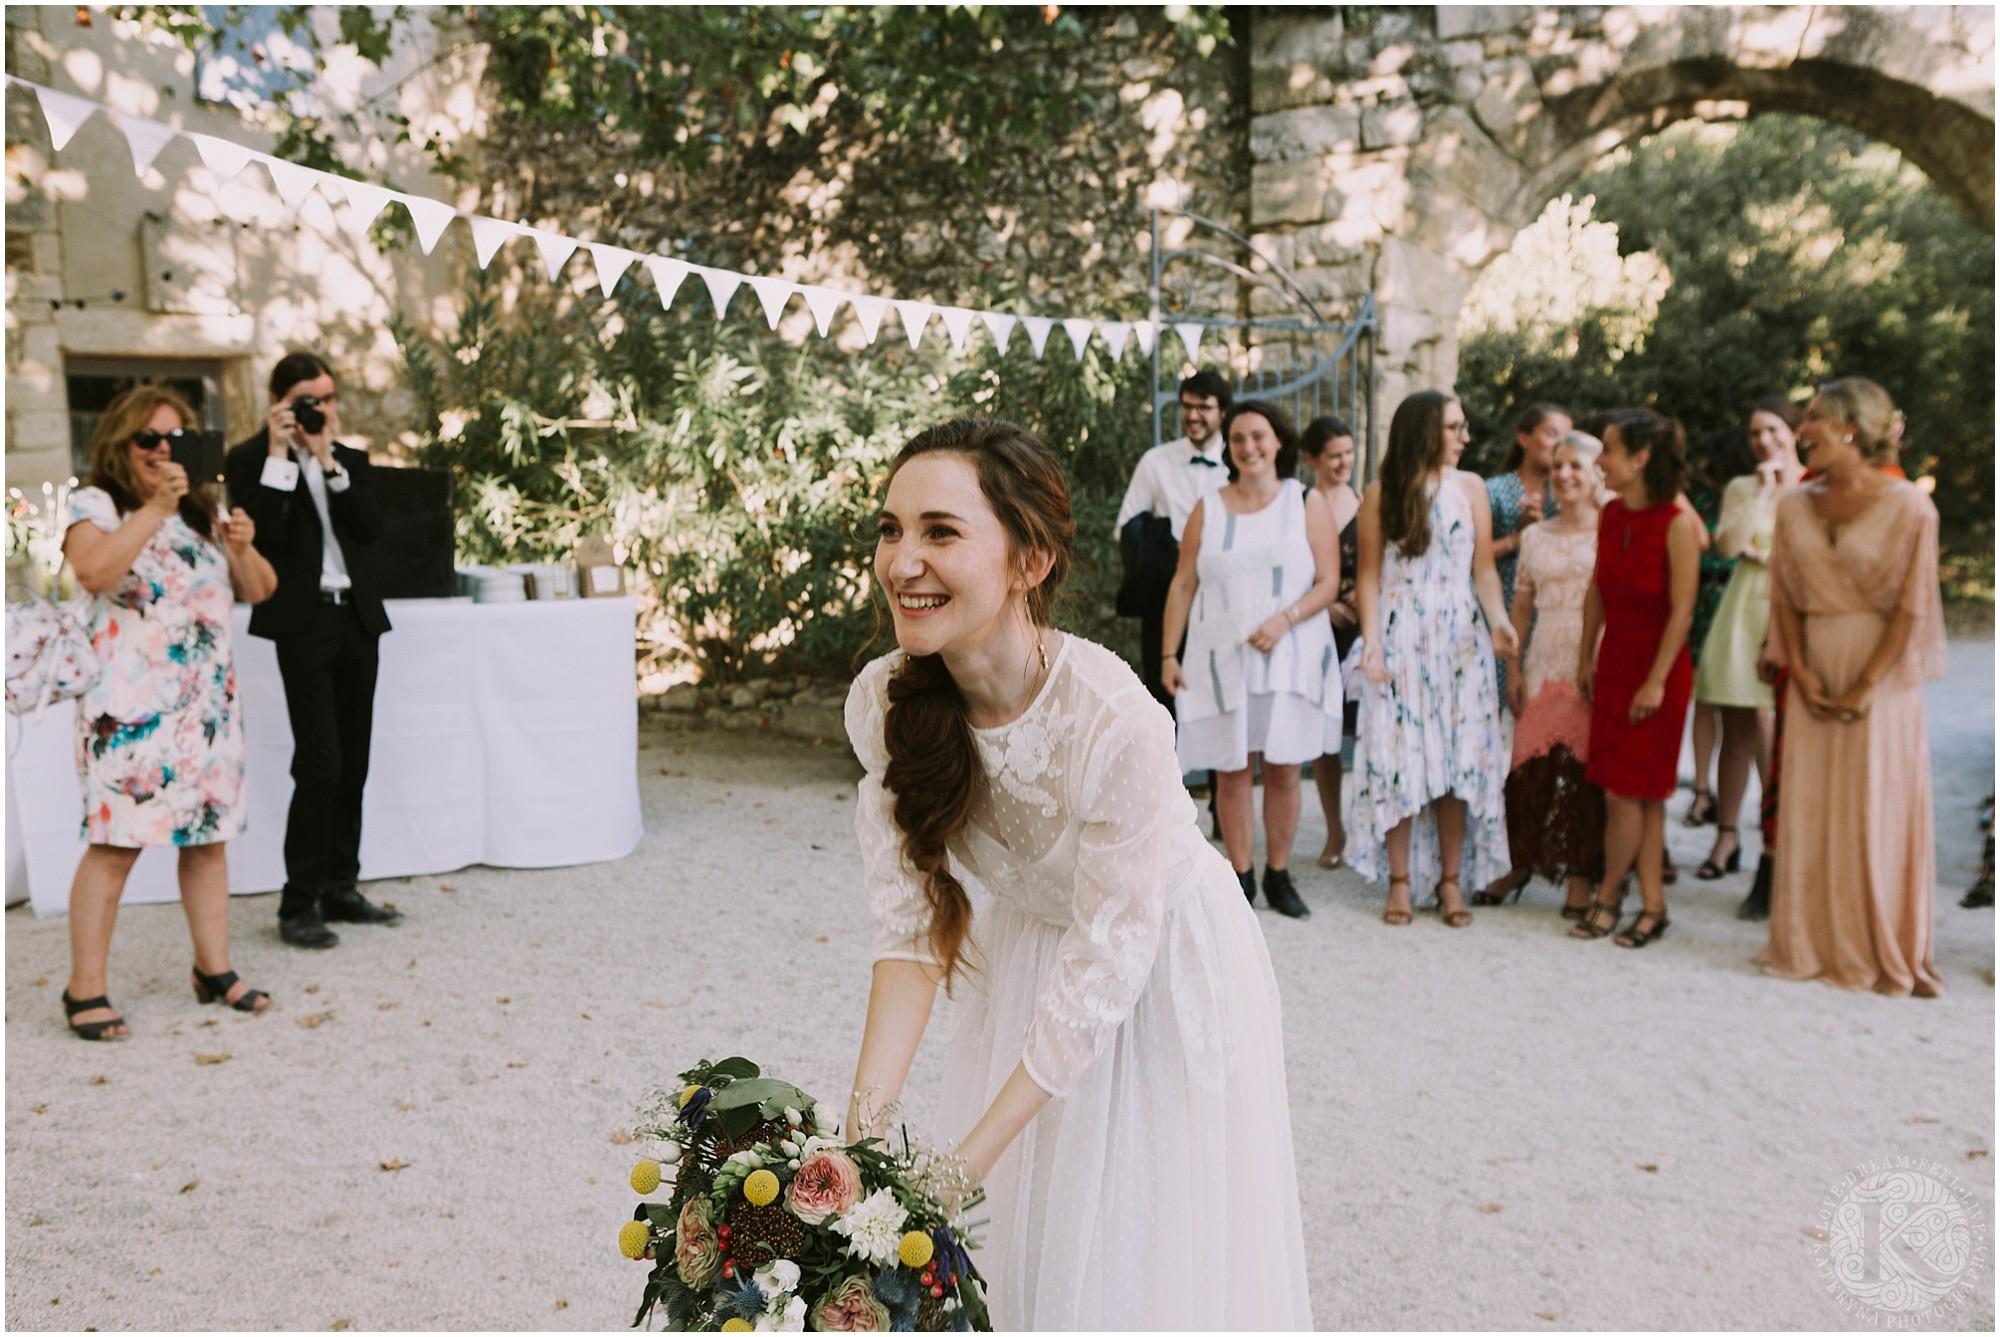 Kateryna-photos-photographe-mariage-vaucluse-provence-avignon-ferme-st-hugues_0063.jpg